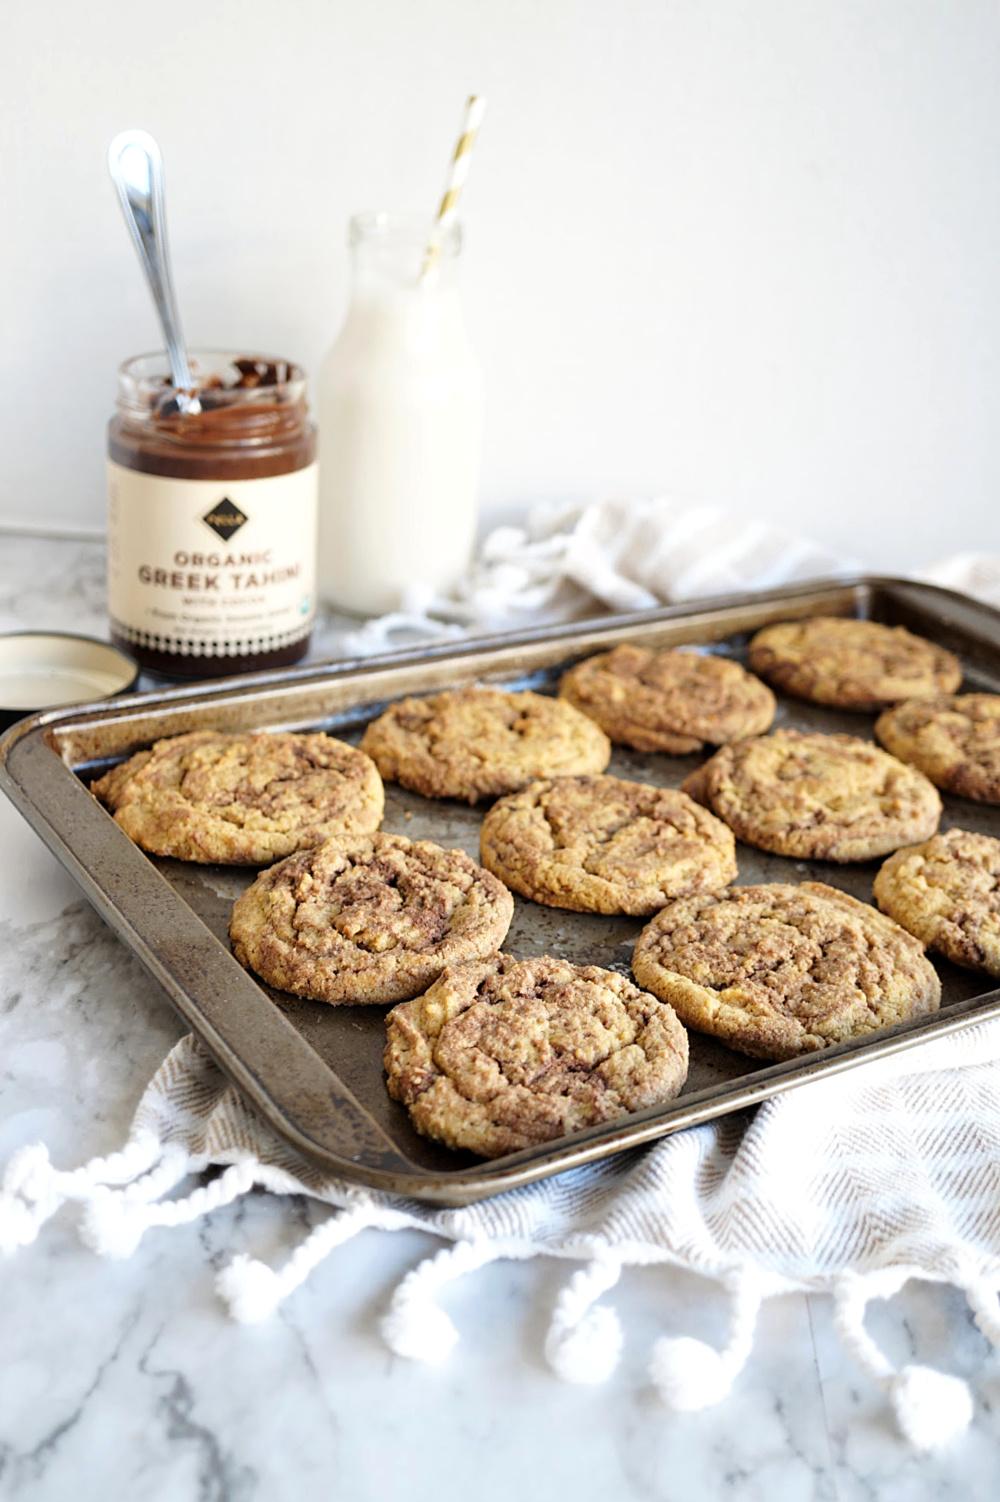 tray of chocolate tahini swirl cookies